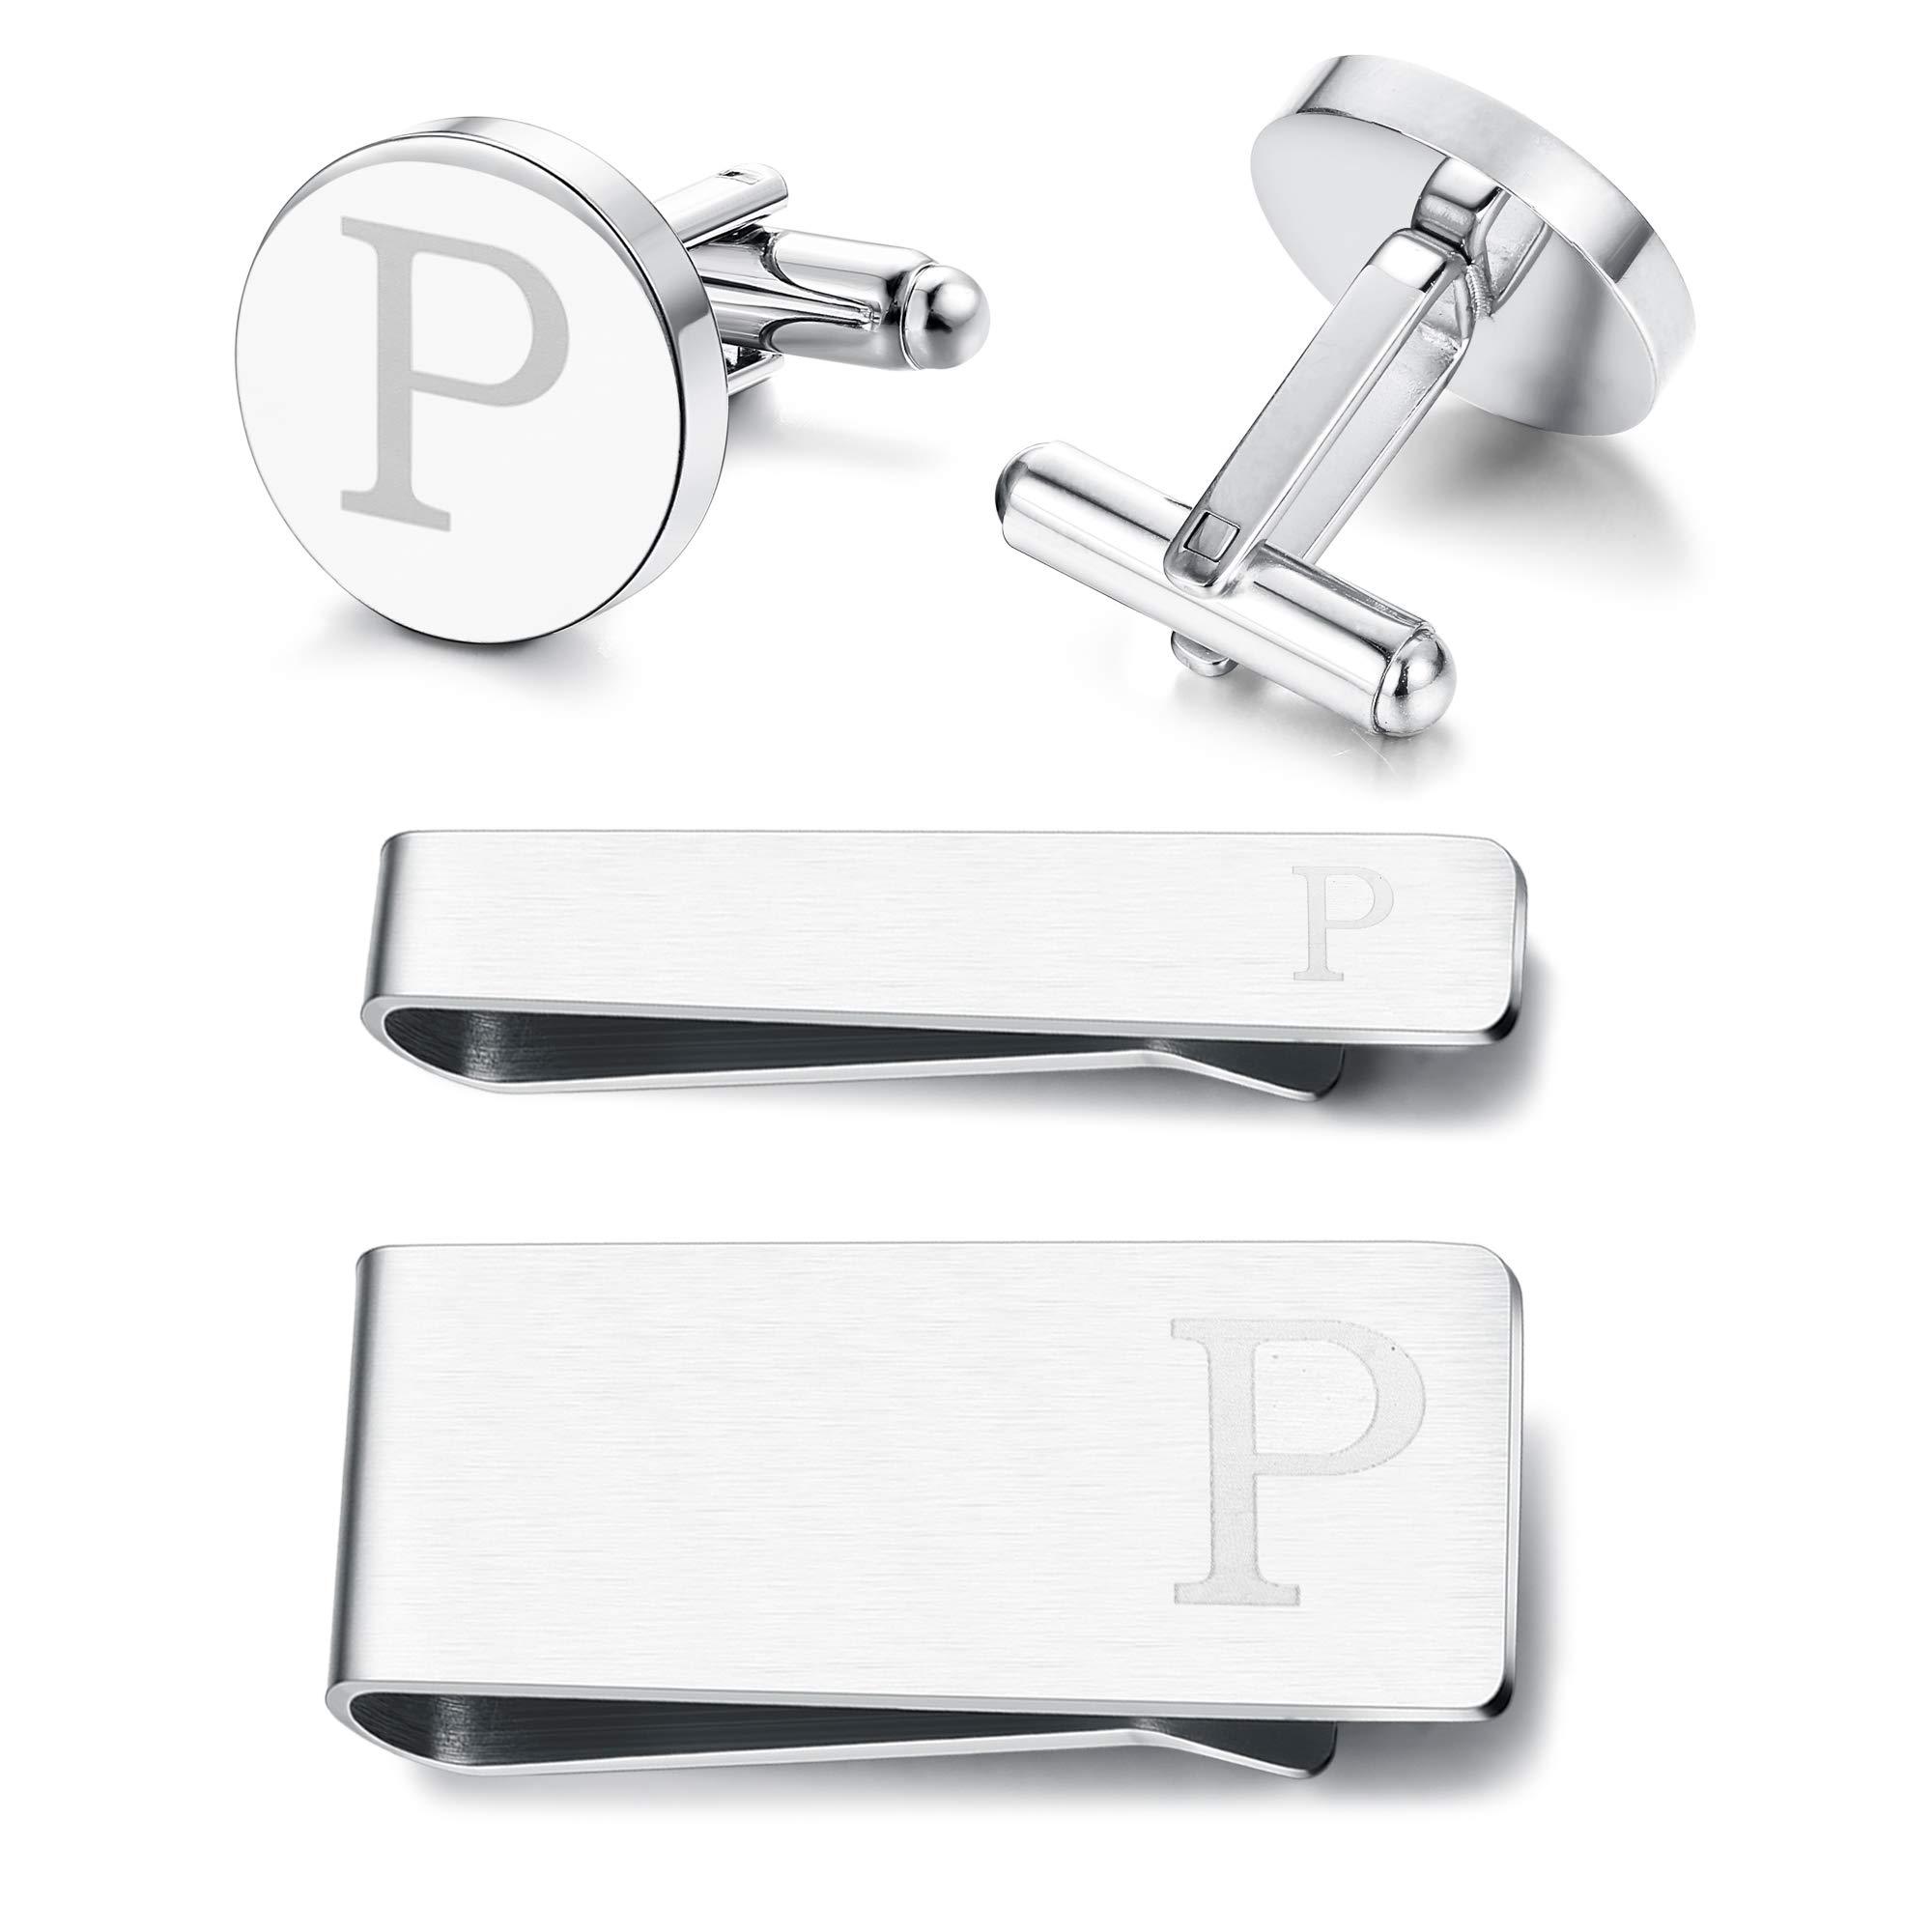 Subiceto Firm Men's Cufflinks Tie Bar Money Clip Set 4 Pcs Engraved Alphabet P Wedding Party Business Gifts